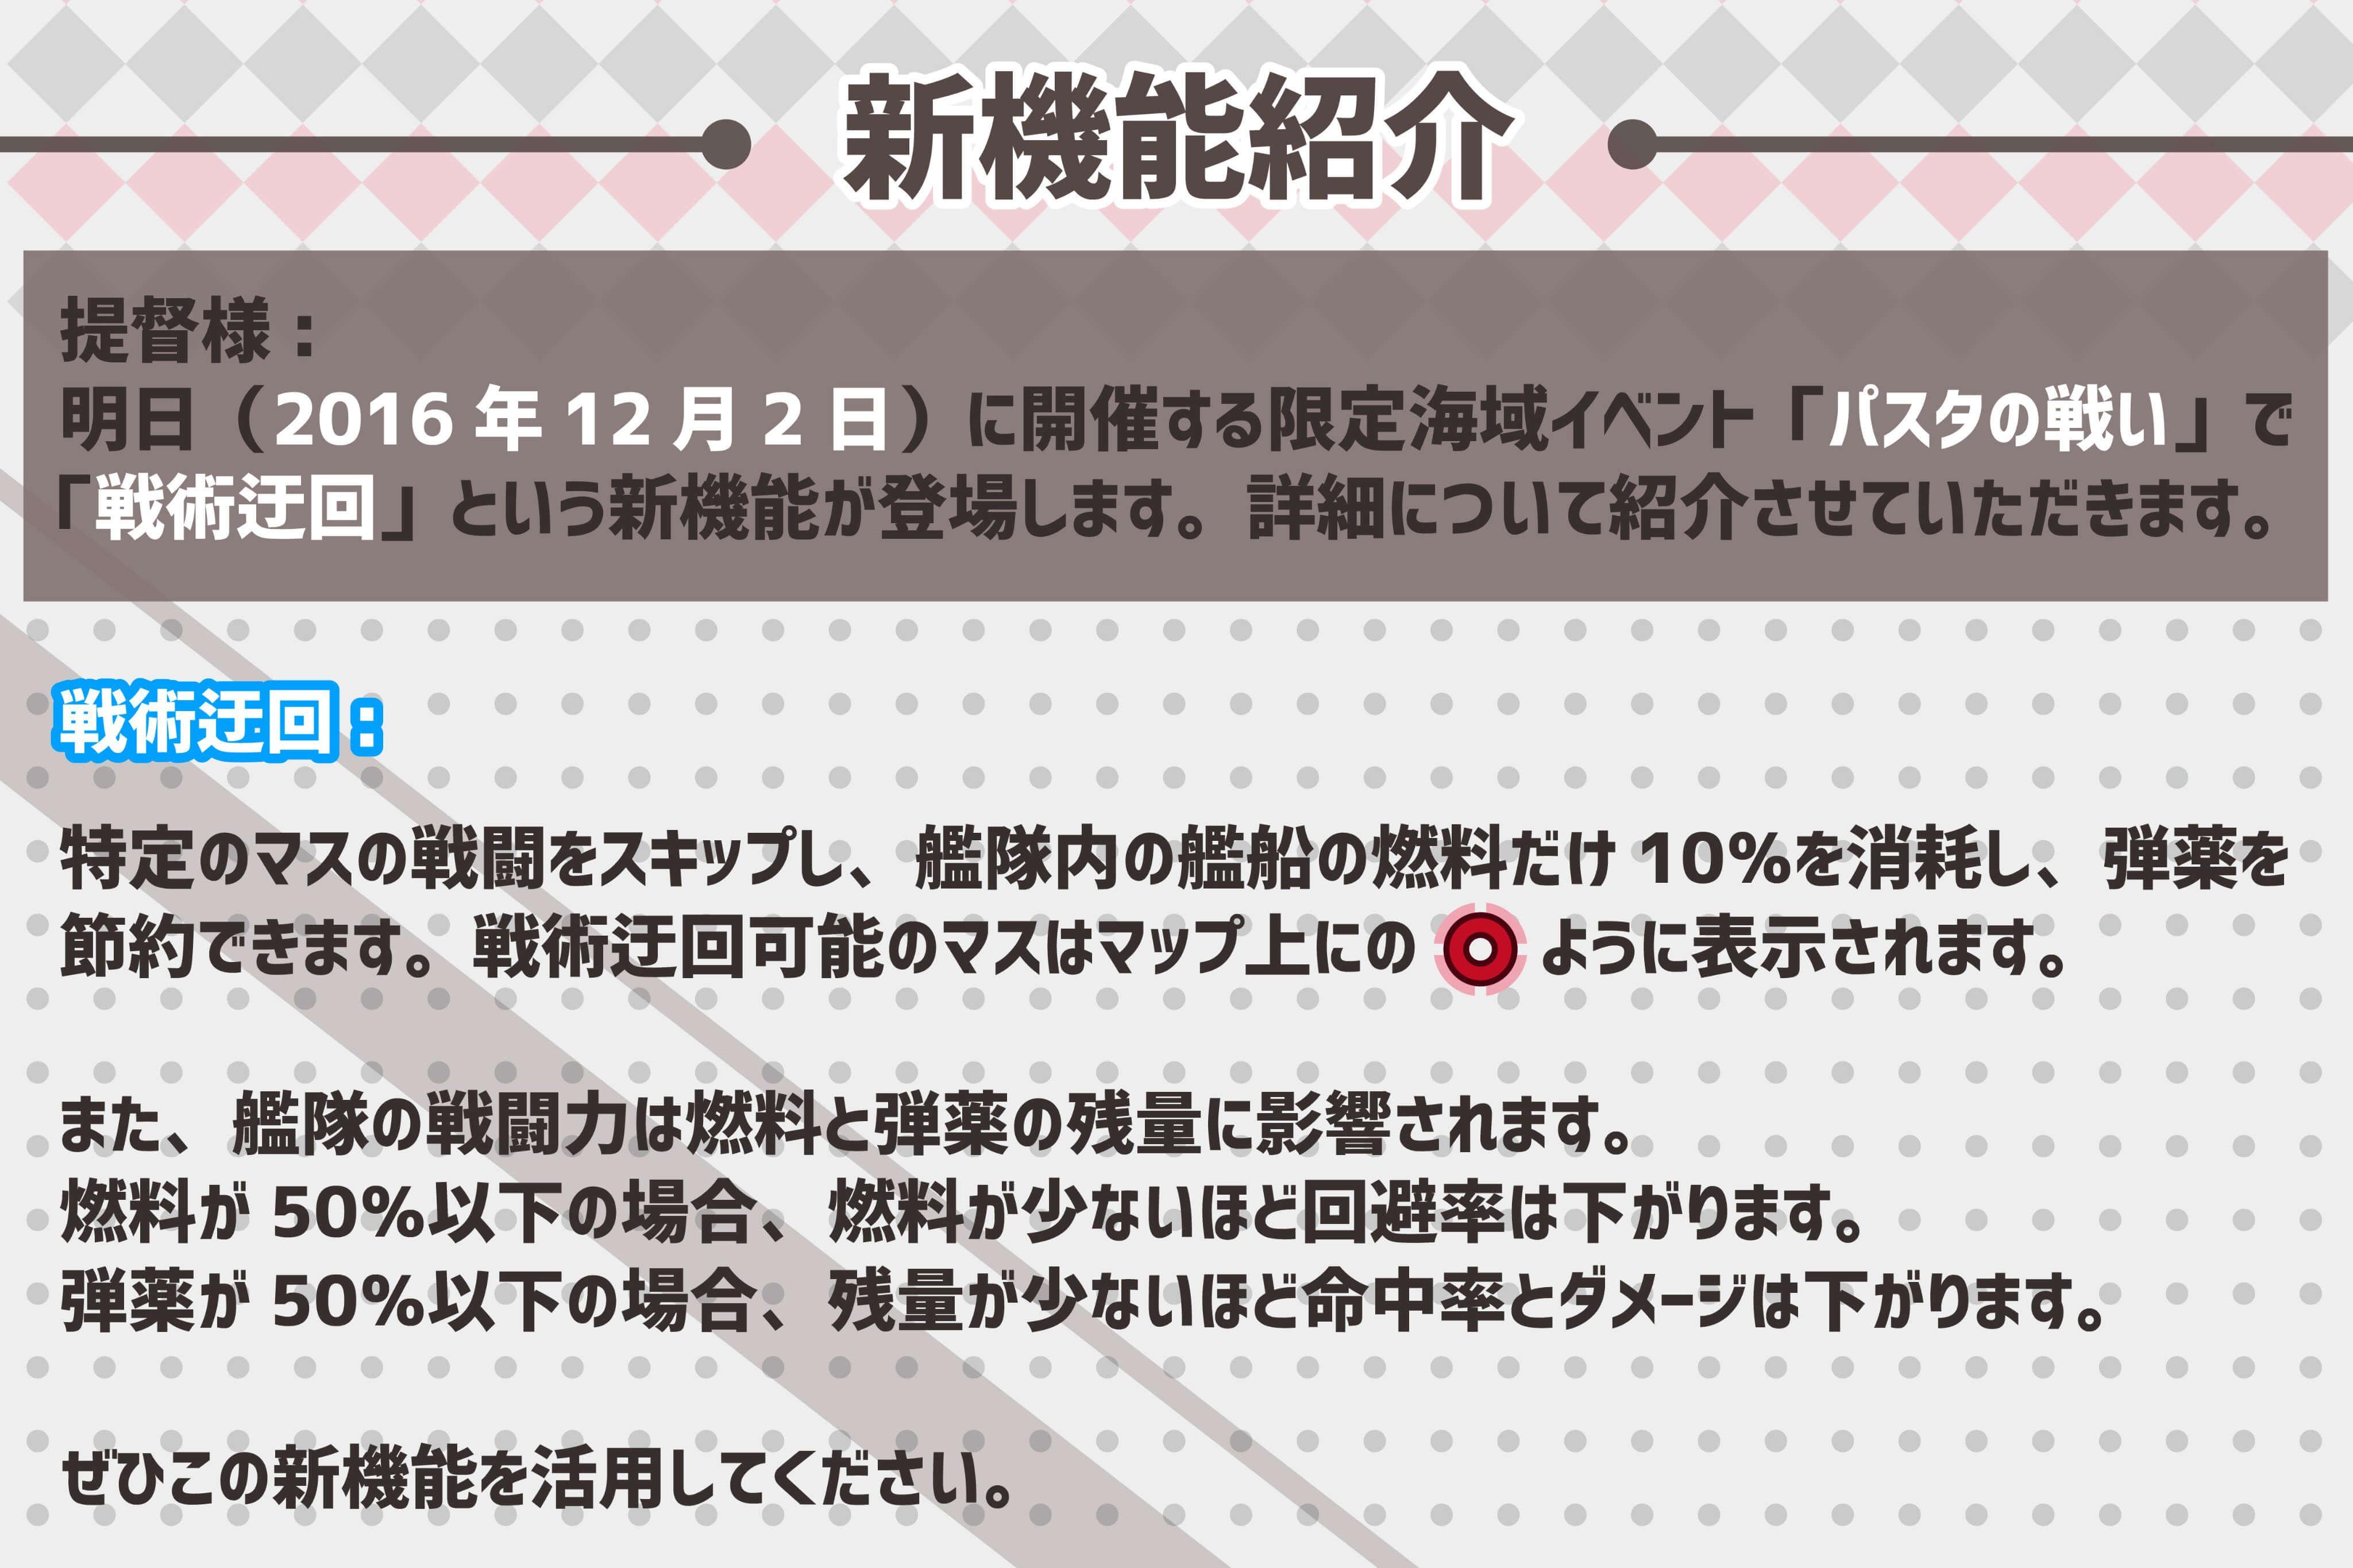 N_SenjutsuUkai.jpg